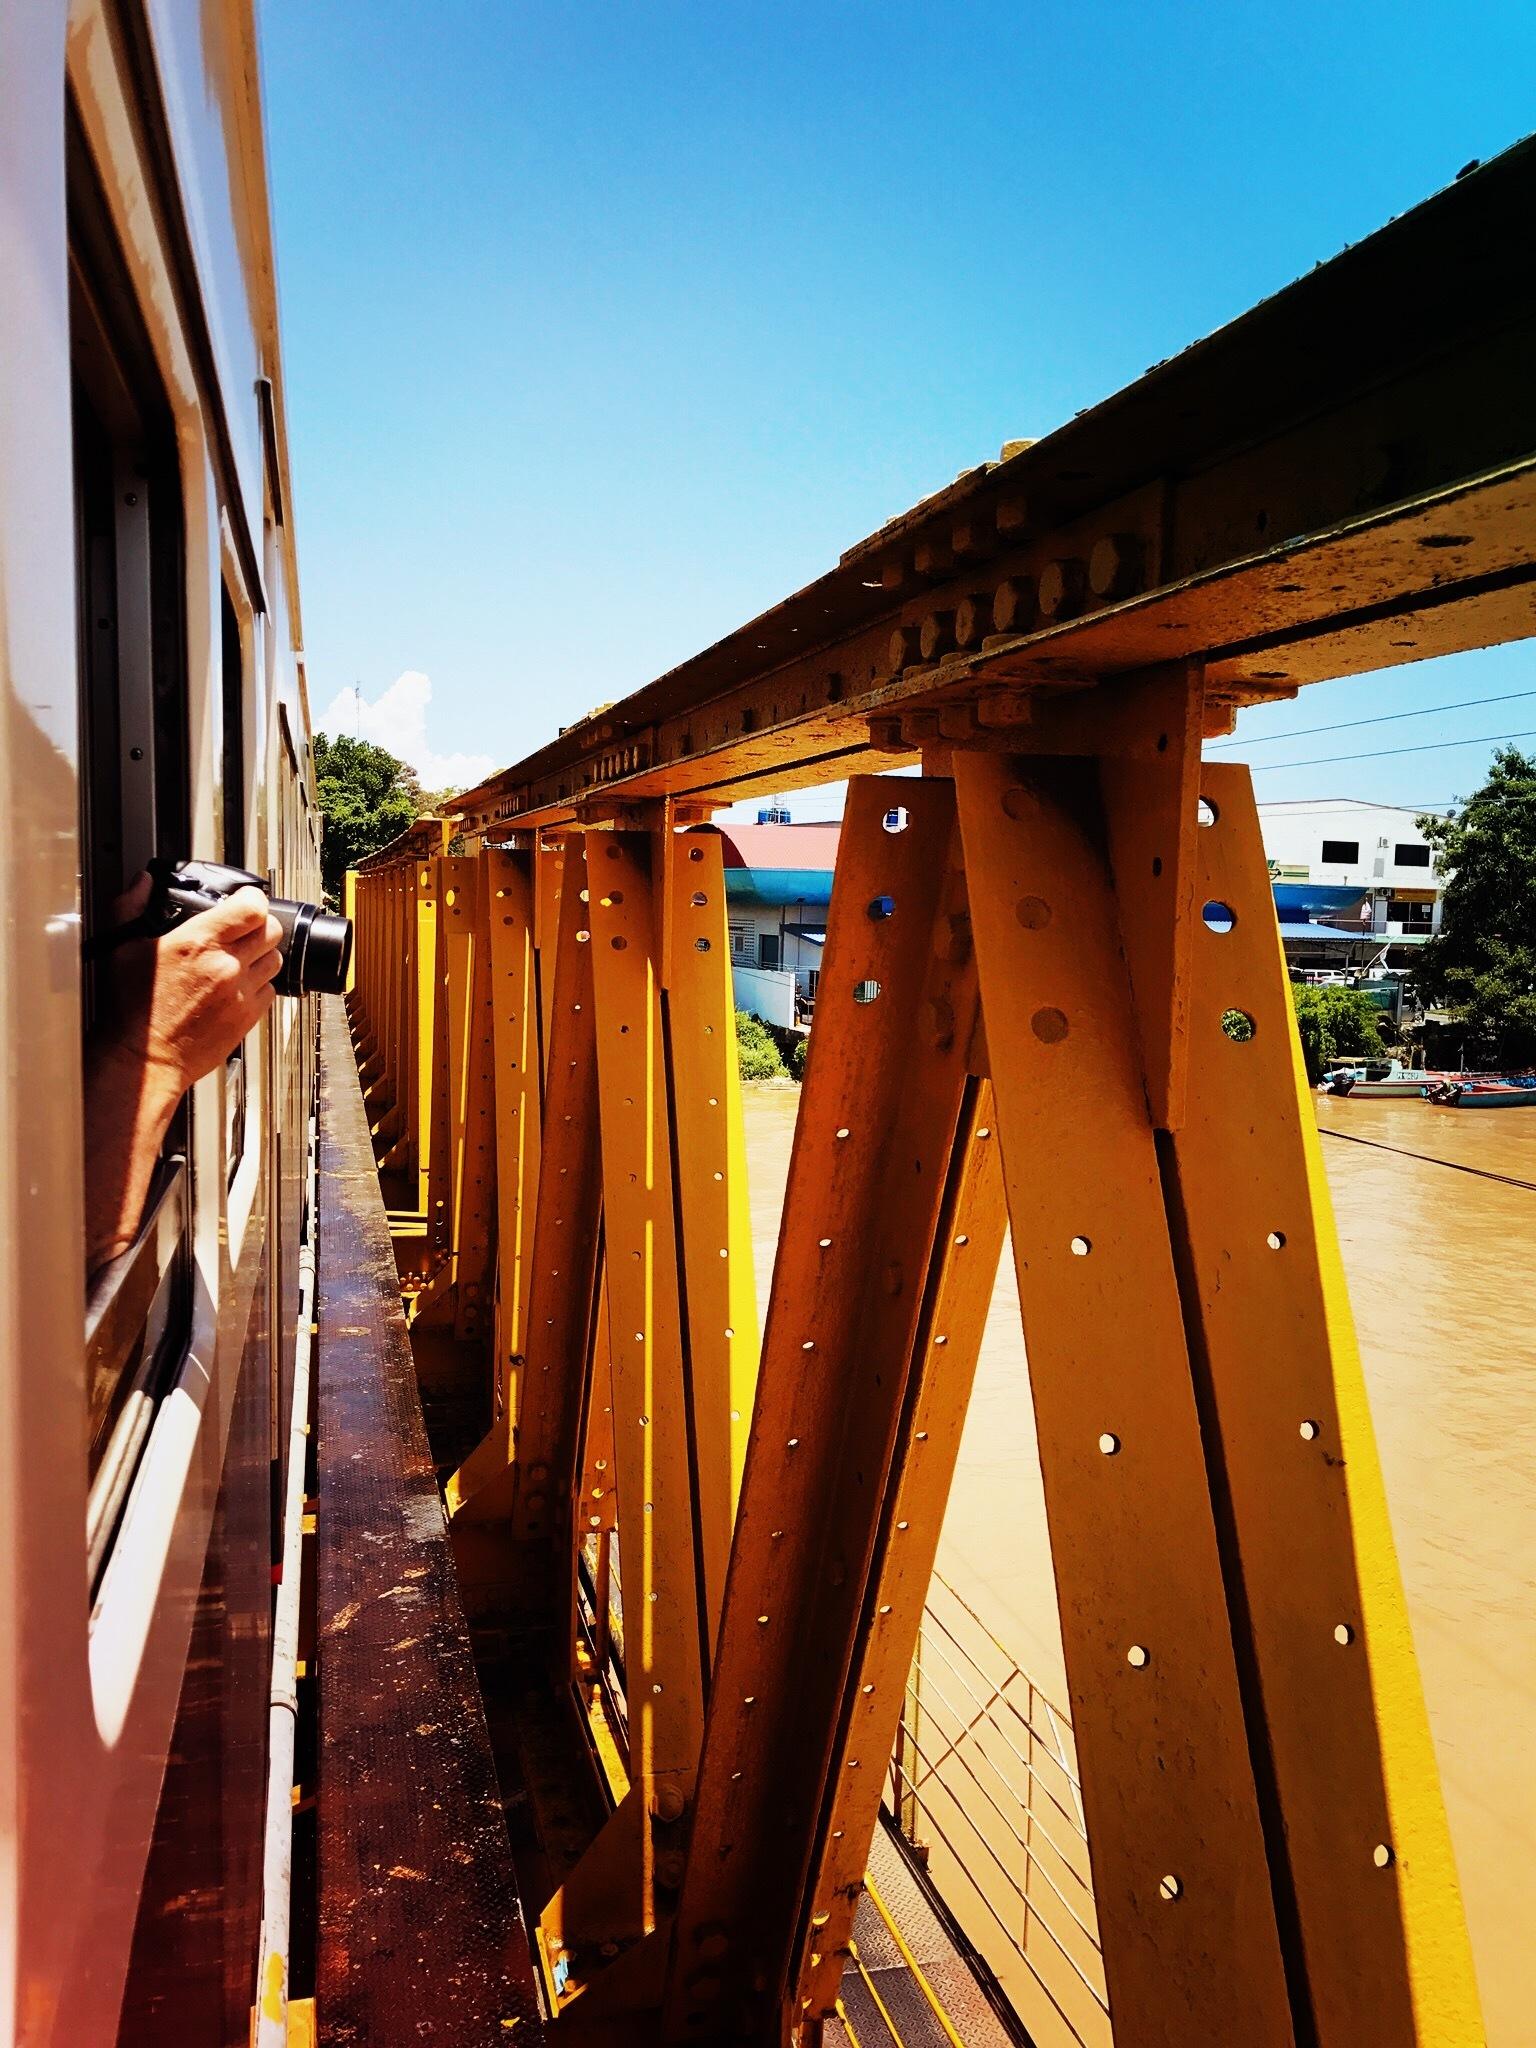 On the bridge  by Adi Gli